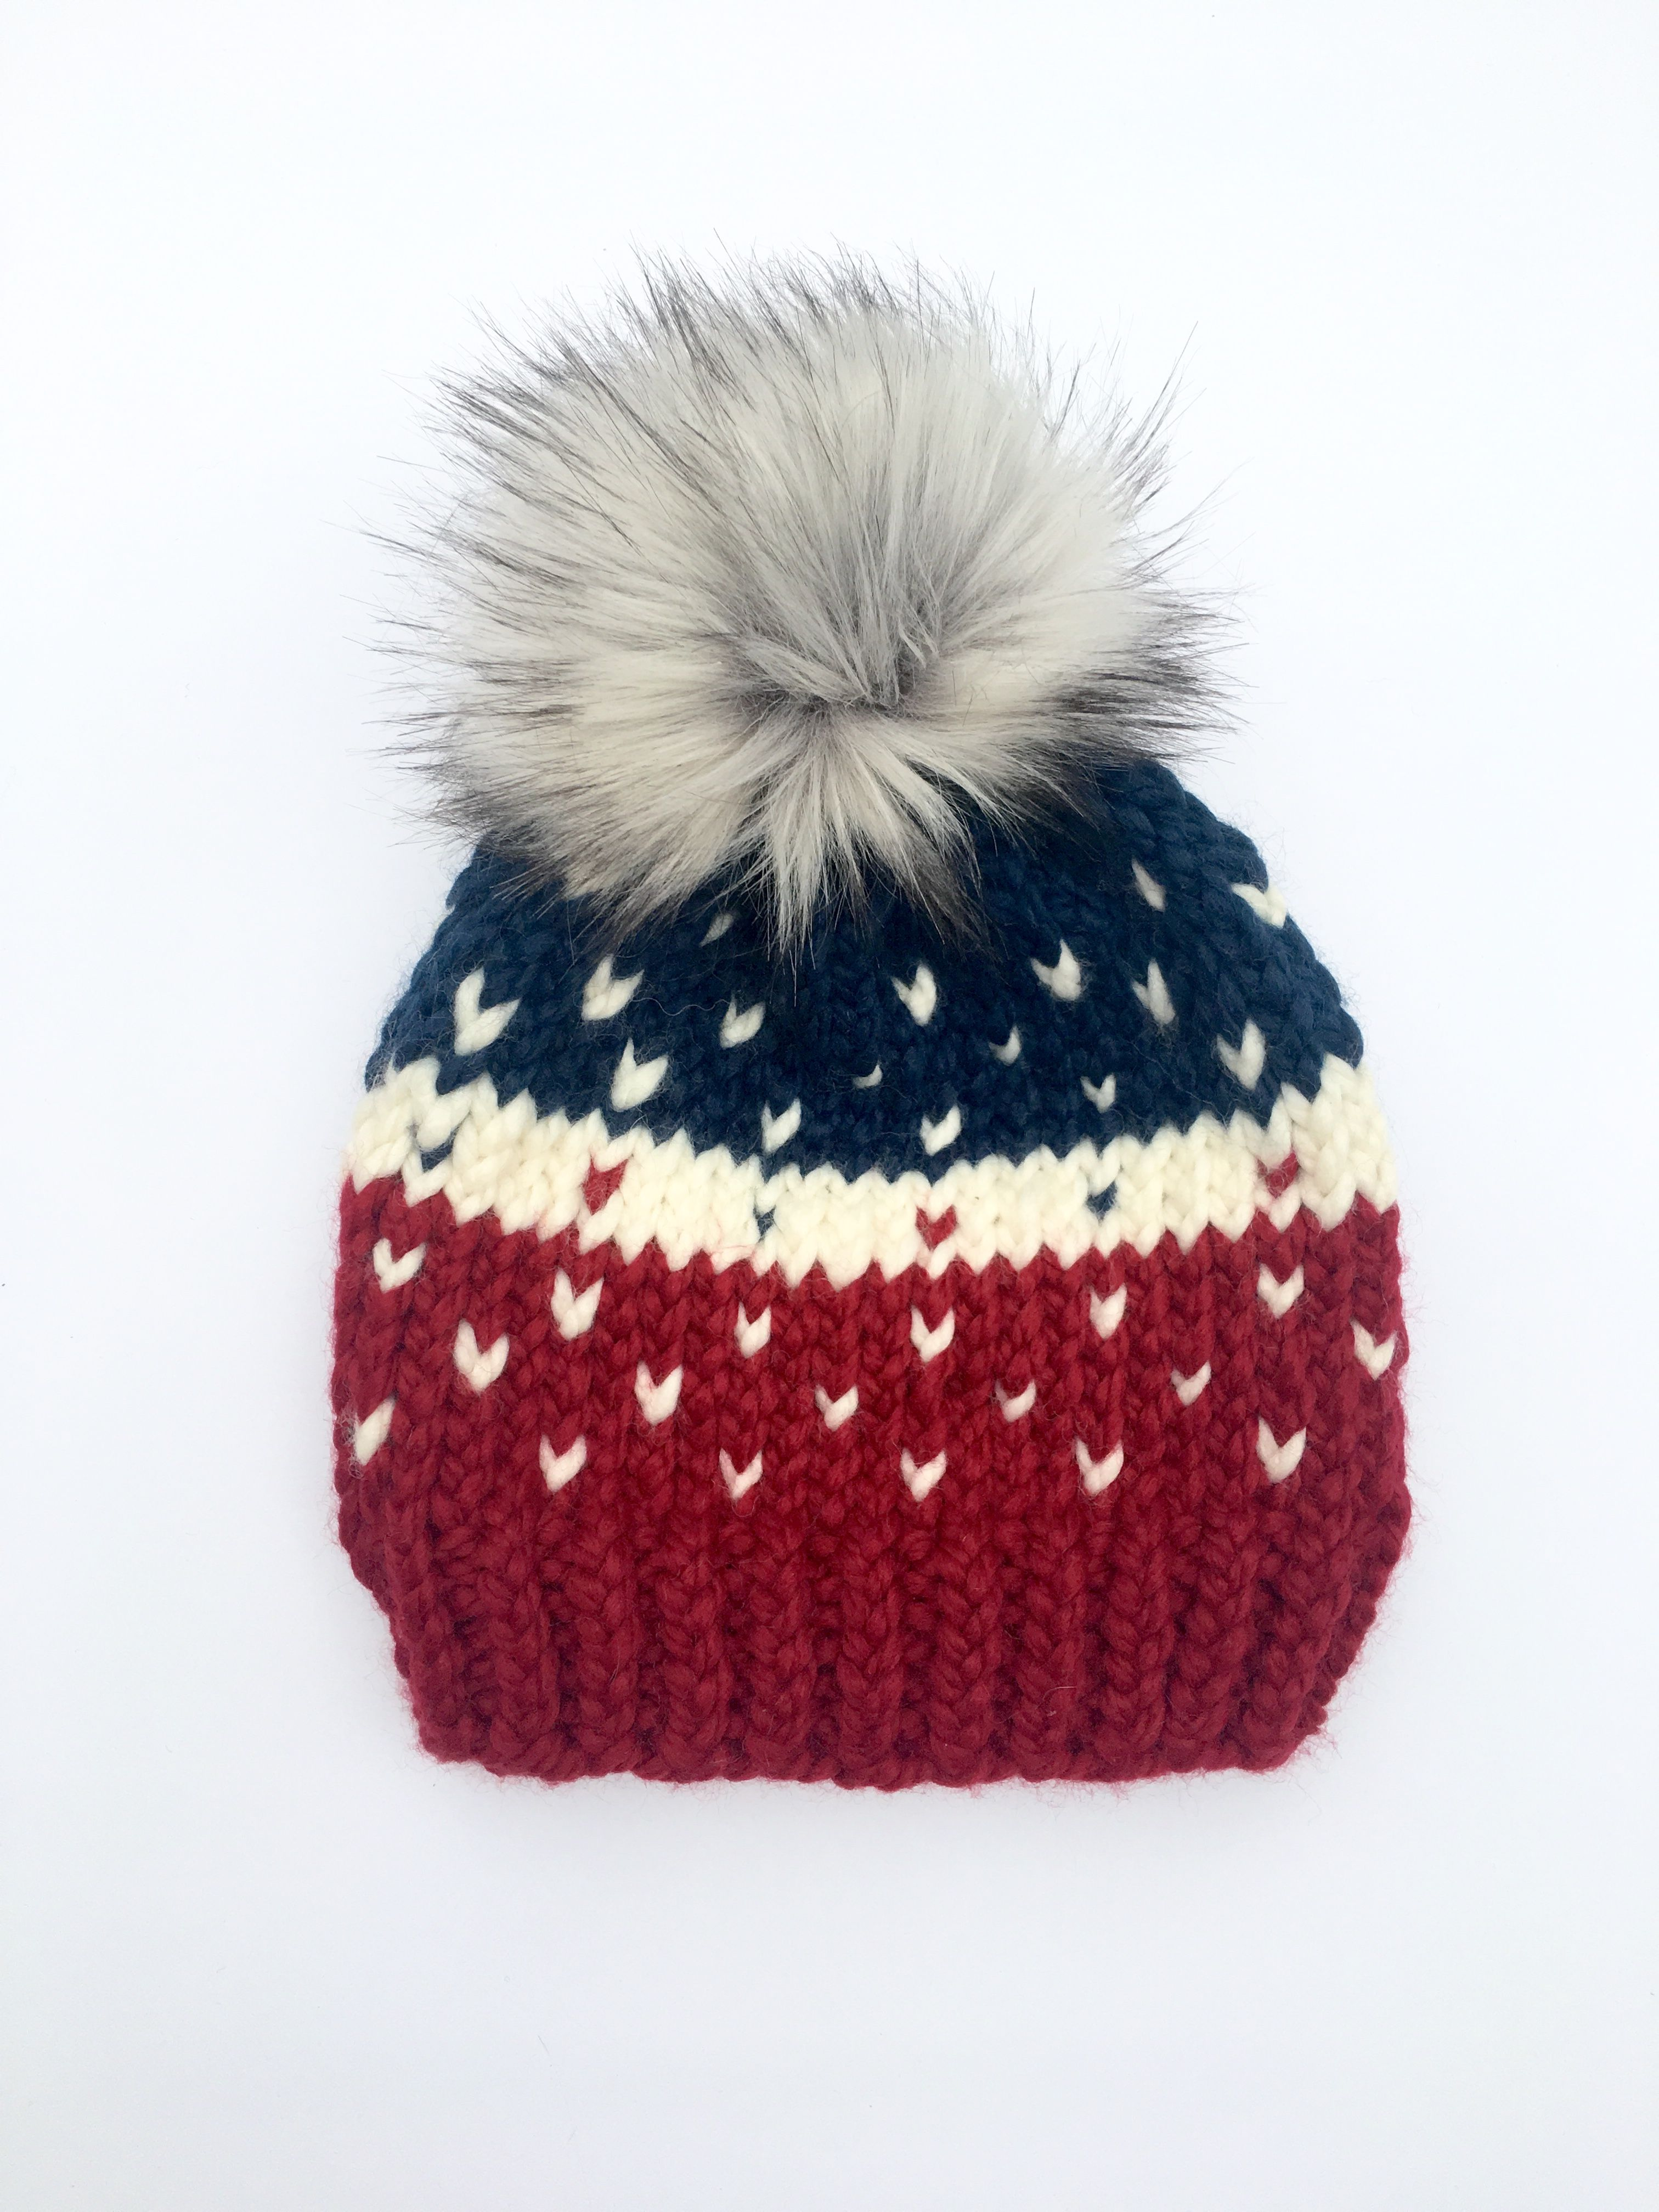 The Patriotic Winnie Beanie  Knit Beanie Womens Beanie  Pom Pom Hats  Winter Hats Christmas Gift